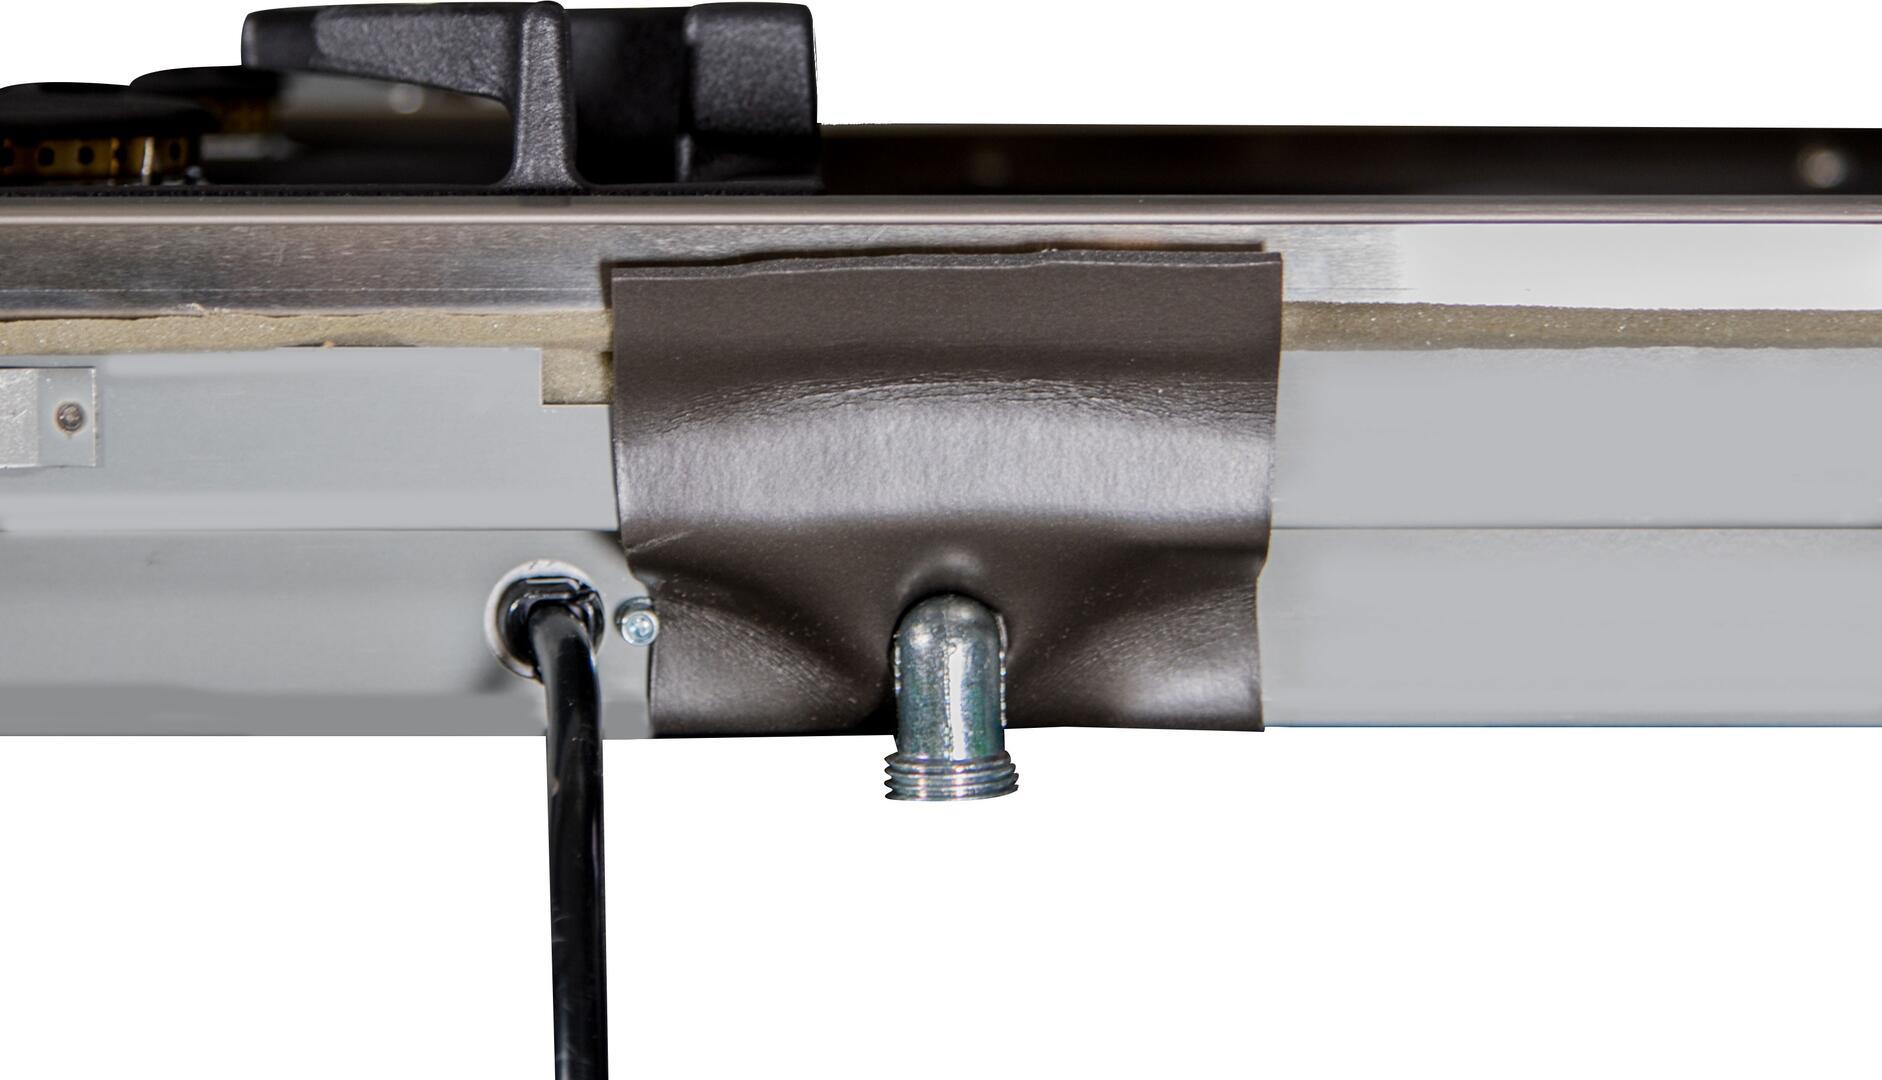 Ilve  UXLP90FI Gas Cooktop Stainless Steel, UXLP90FI Gas Connector